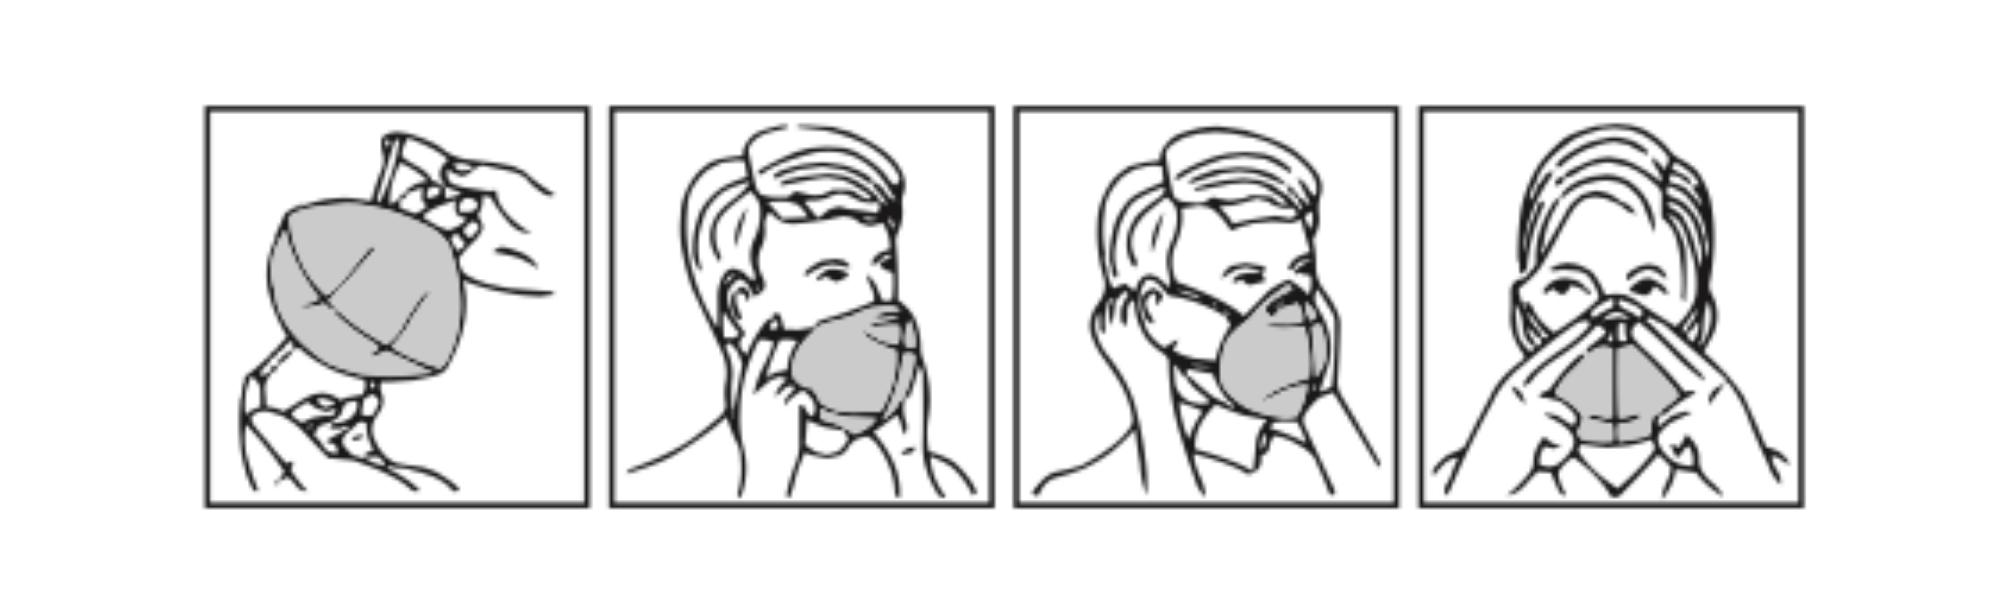 Come Indossare una Mascherina FFP2